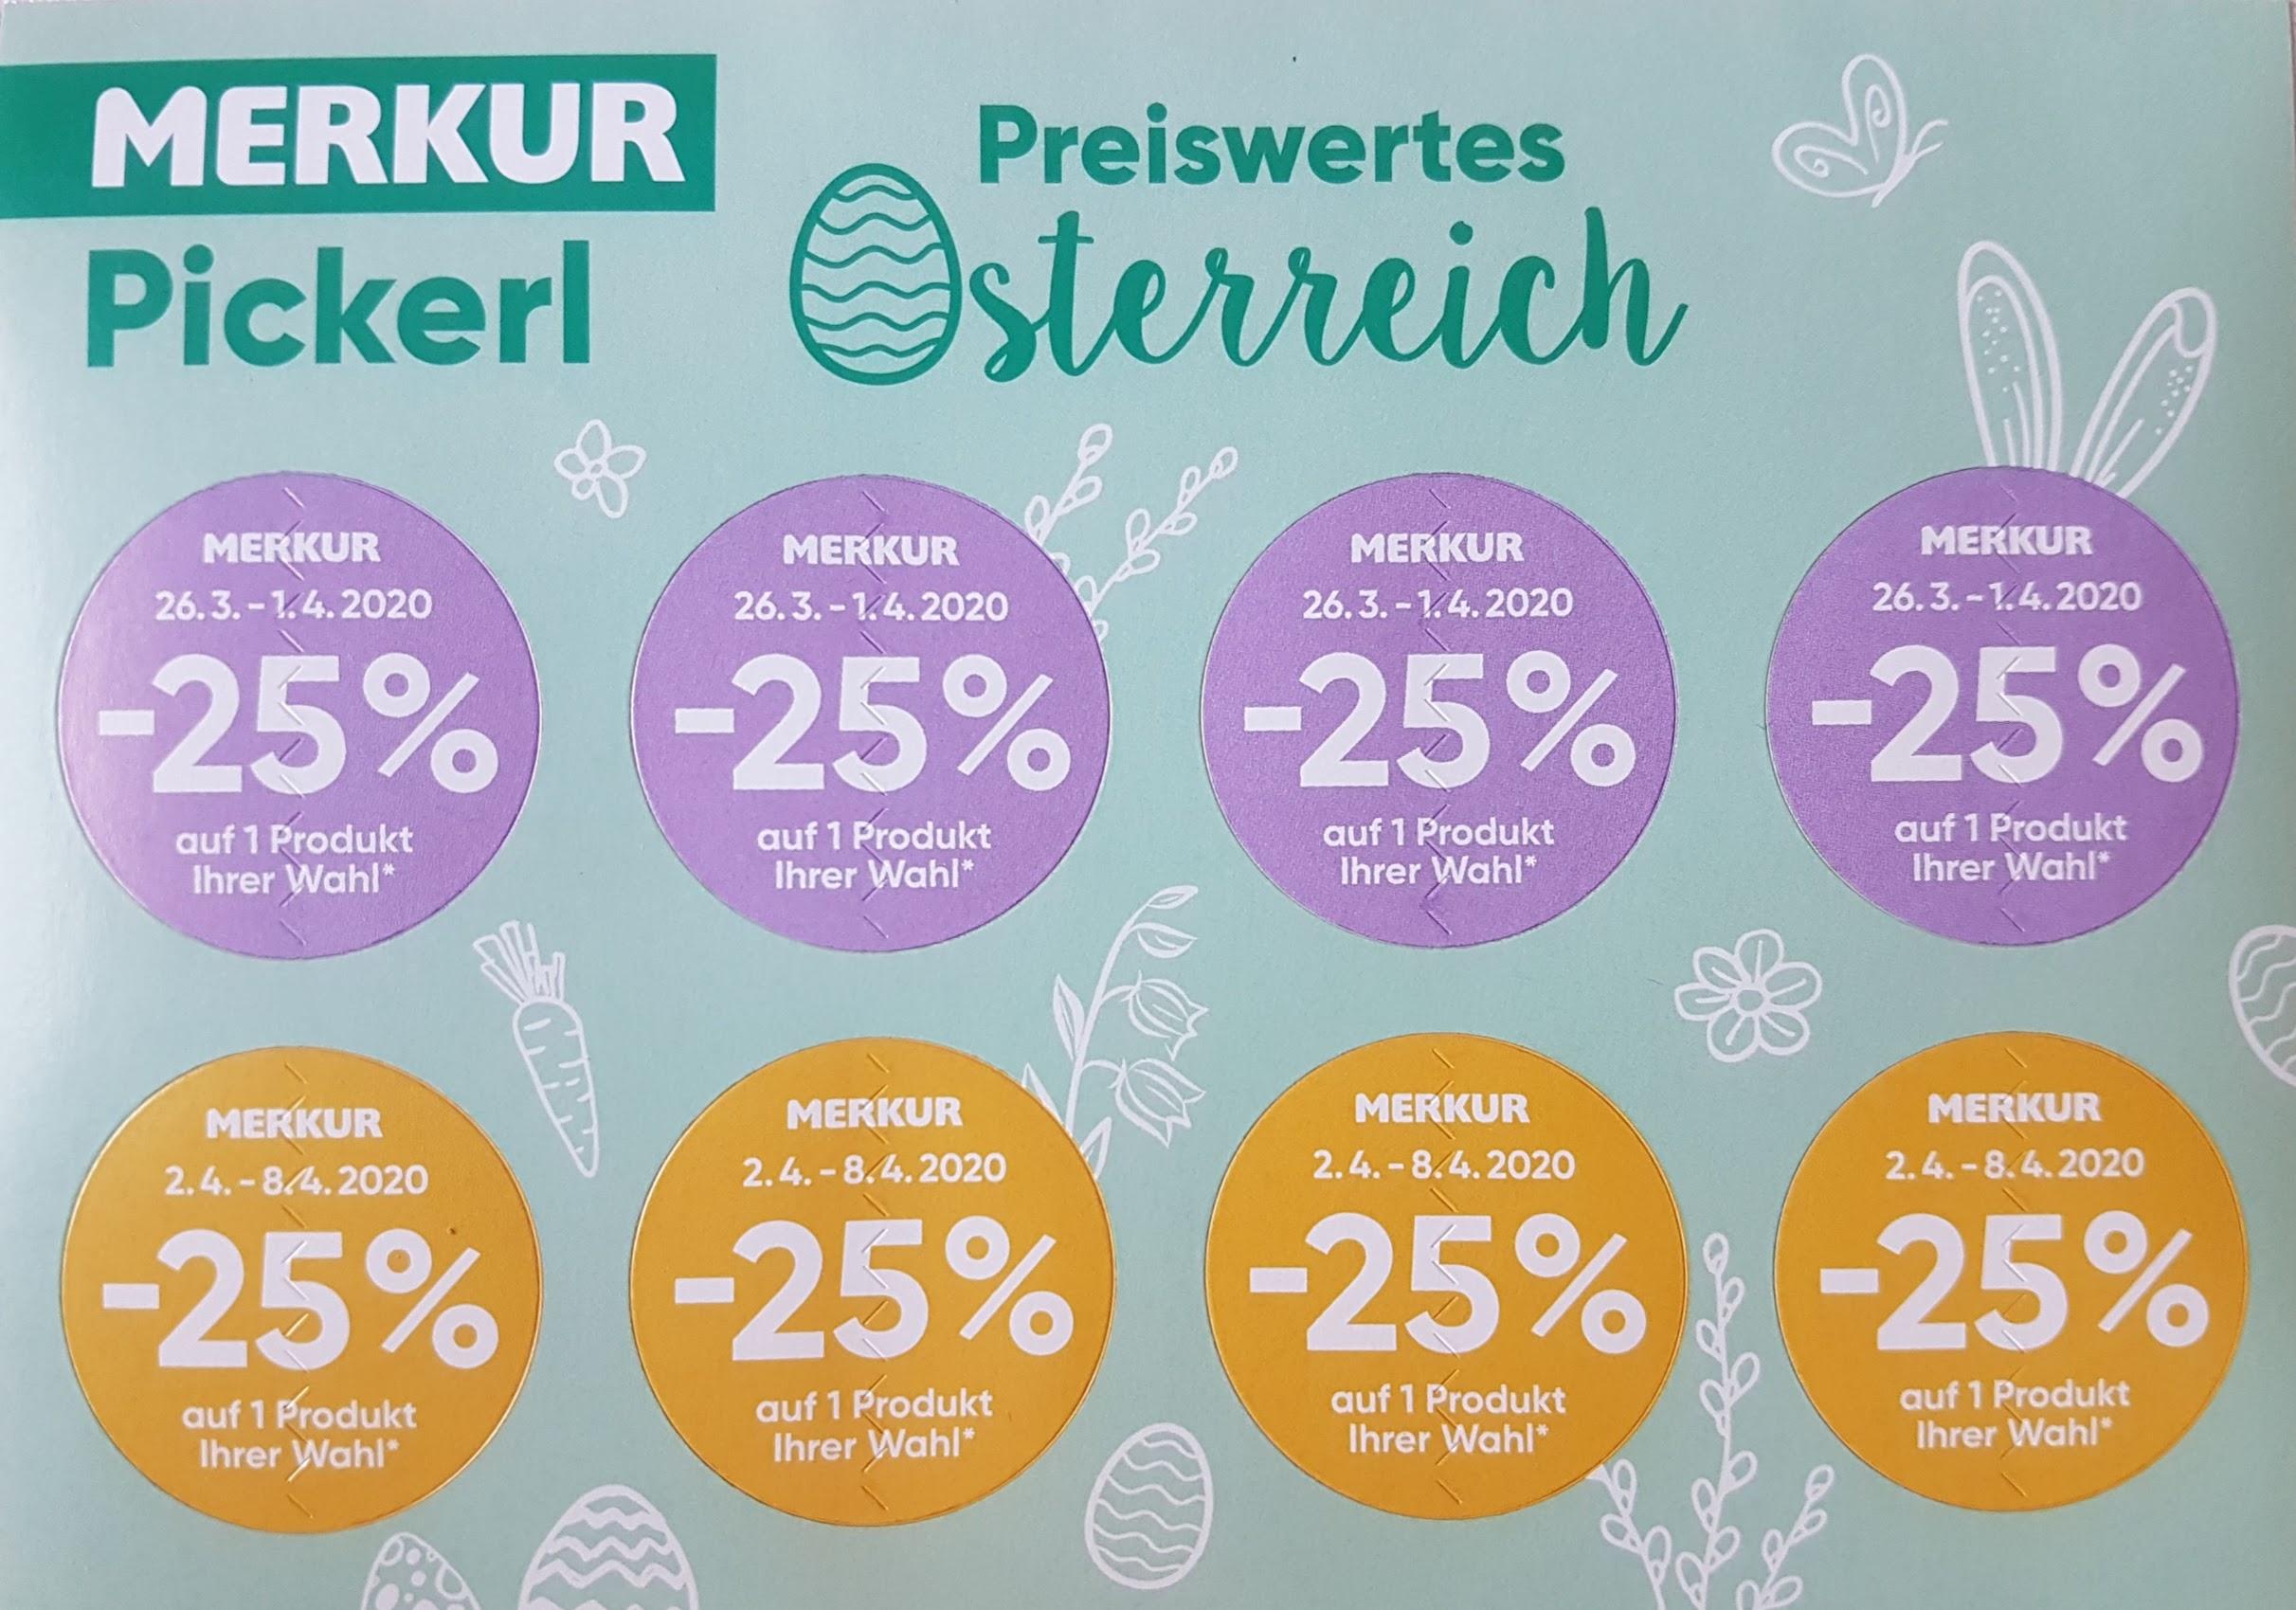 Merkur -25% Pickerl 12.03.20 - 08.04.20 - DIGITALE Pickerl zum Ausdruck!